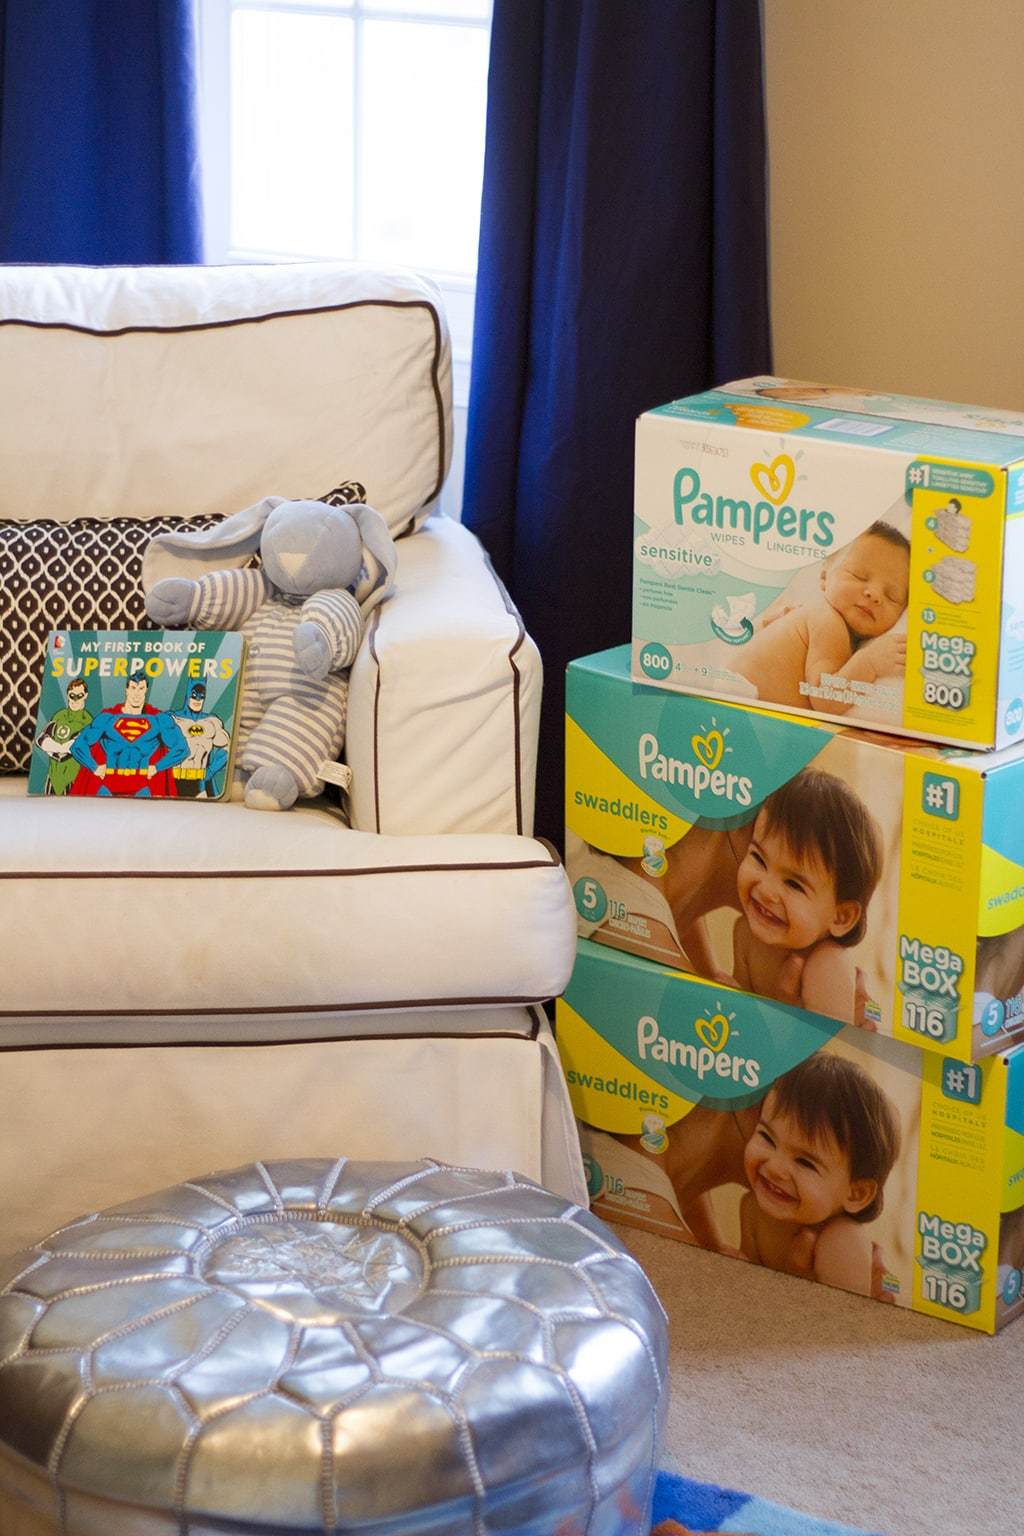 Sams Club Pampers Diapers